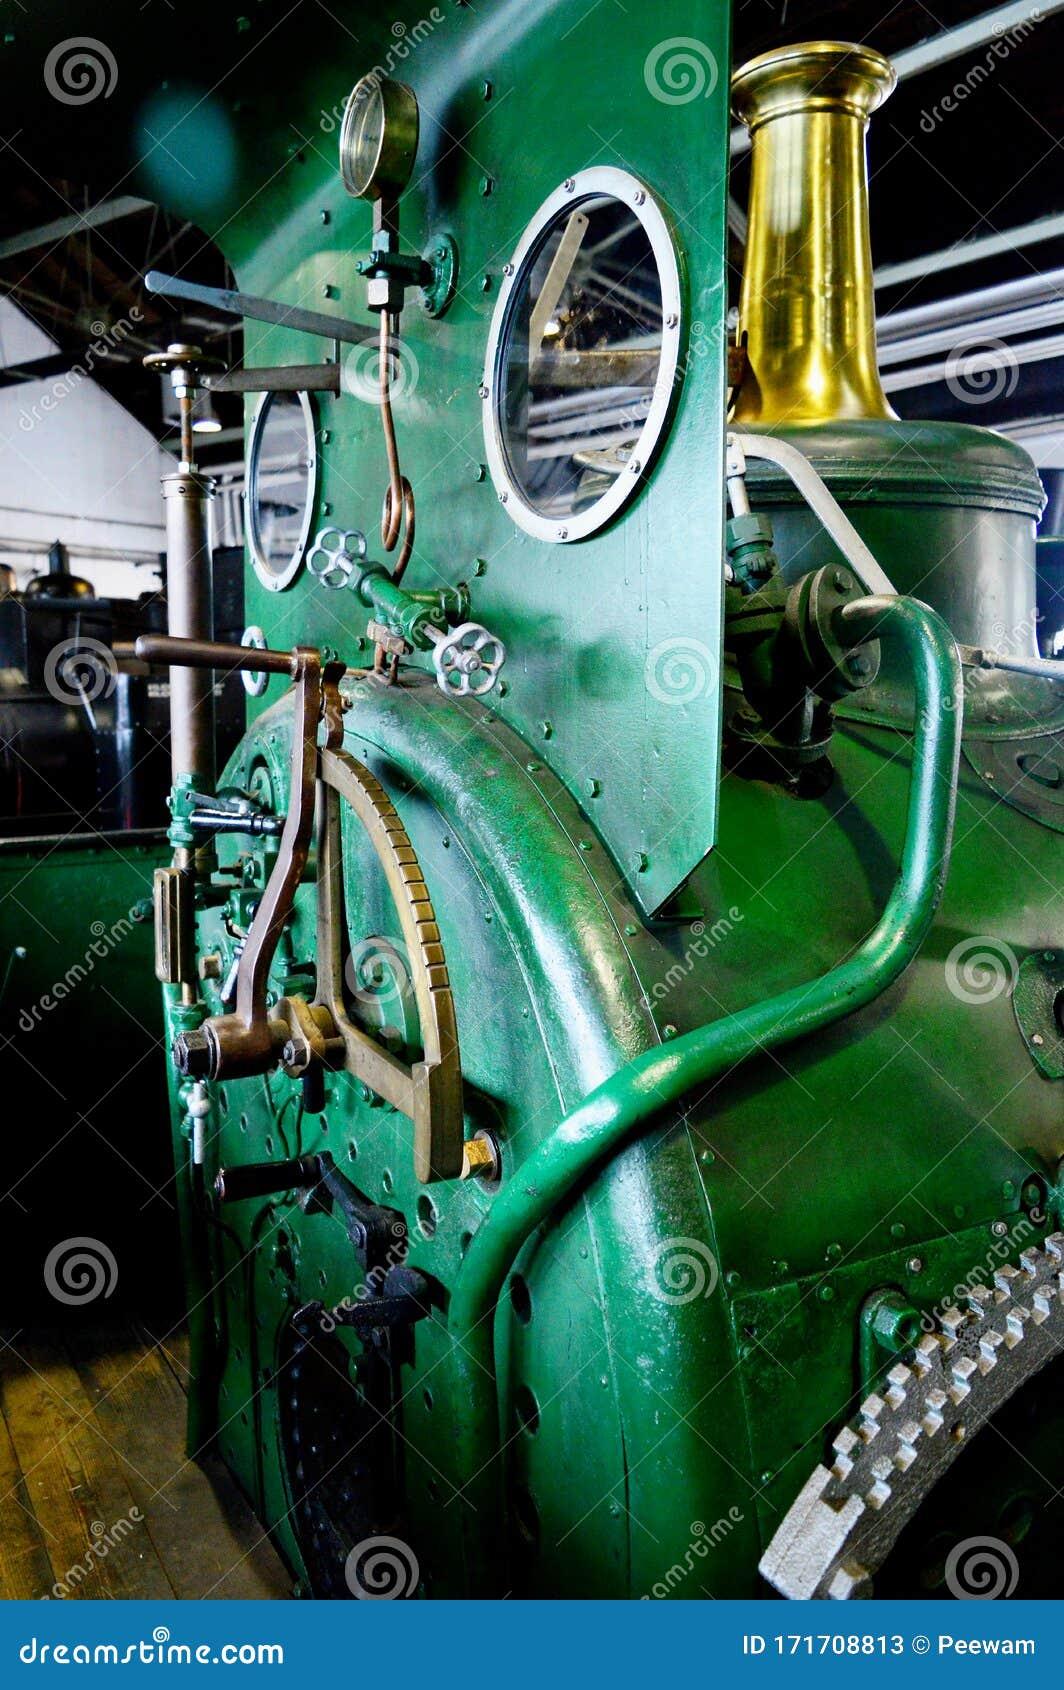 Railway Museum Of Slovenian Railways Railway Ljubljana